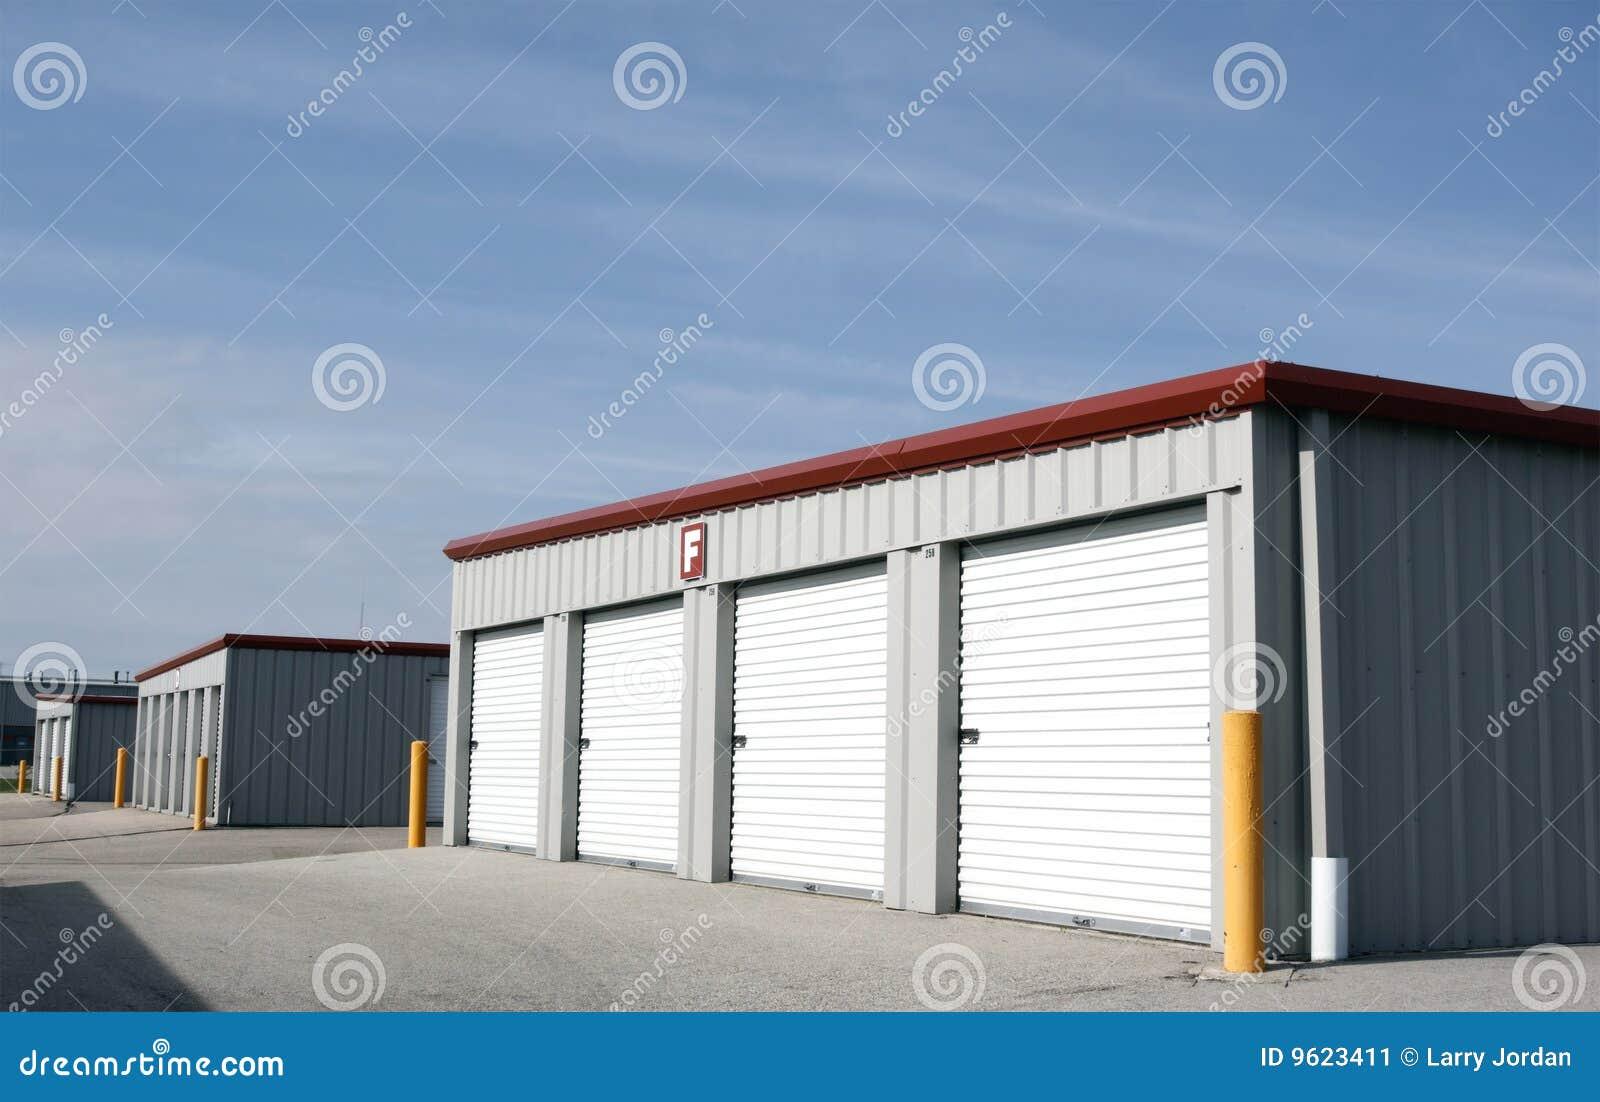 Personal rental storage units stock image image 9623411 for Big garage for rent